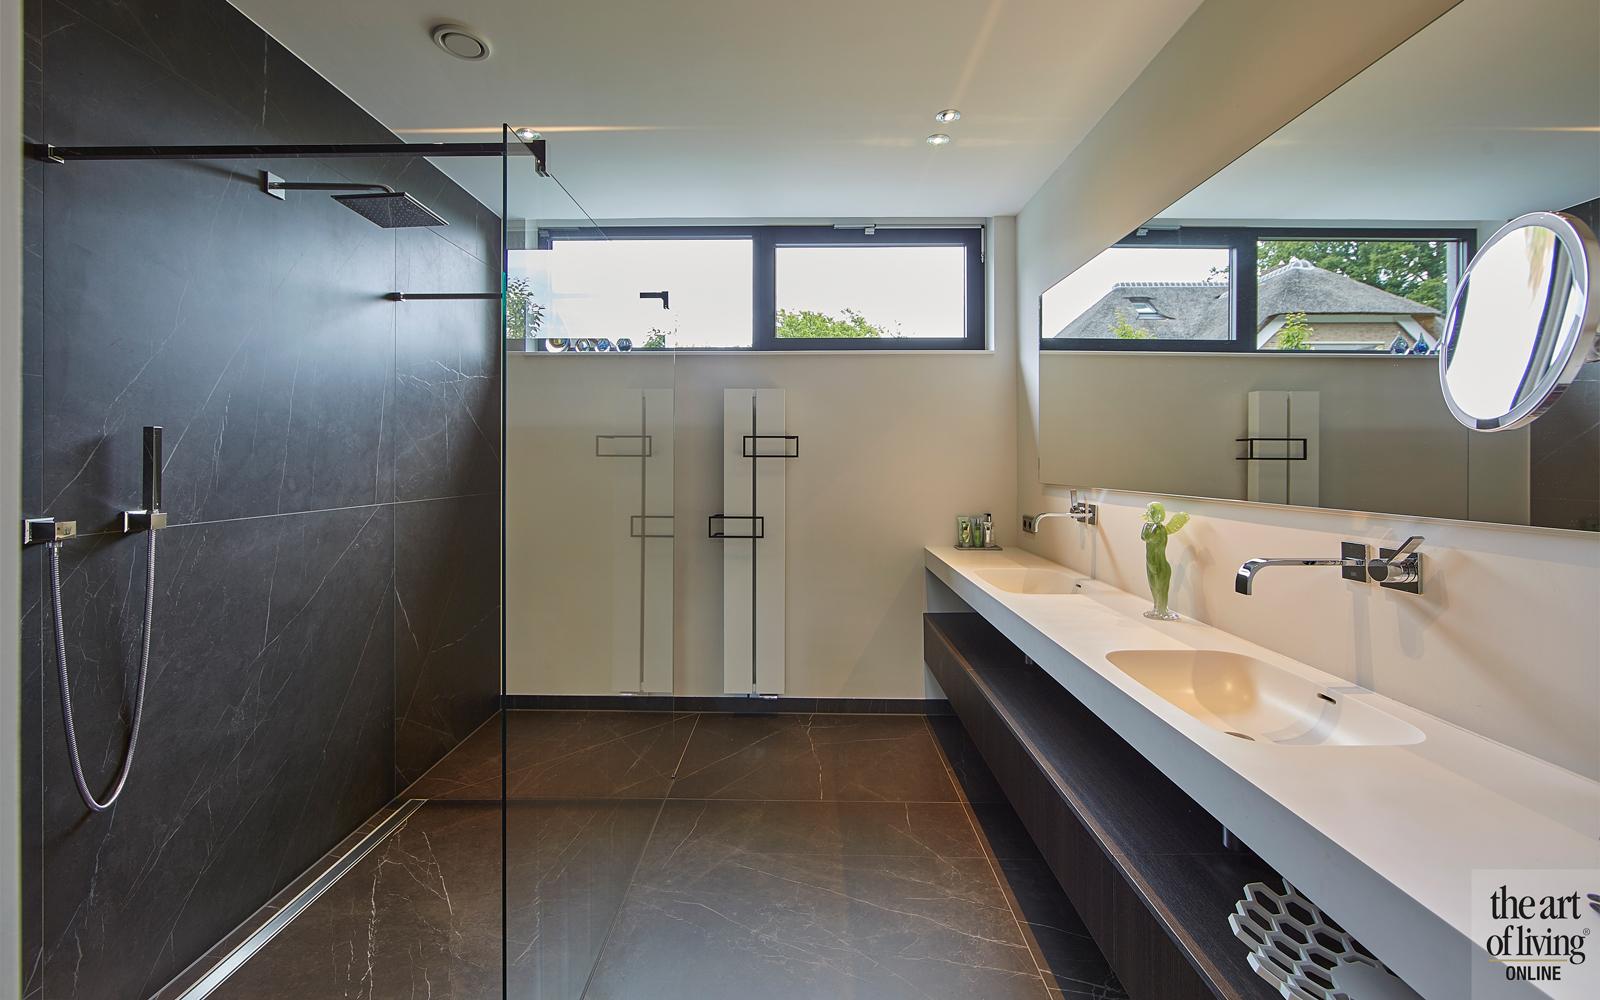 Design haard, Boley, Badkamer, Moderne badkamer, Badkamer design, Strakke badkamer, Tegelvloer